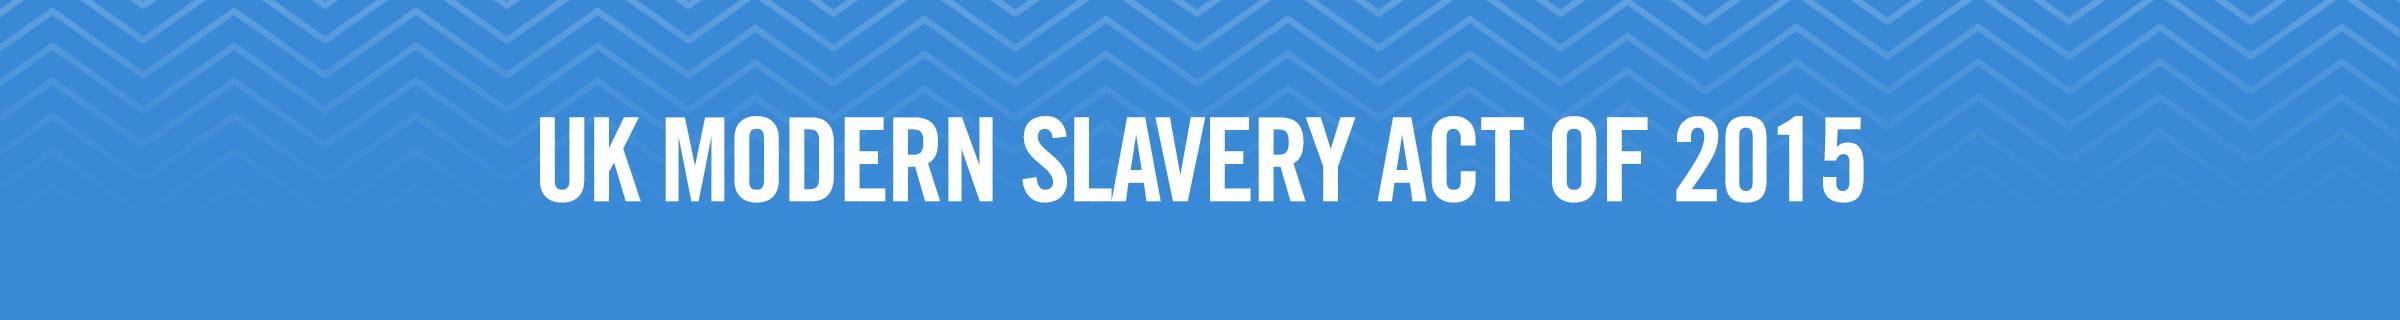 UK Modern Slavery Act of 2015